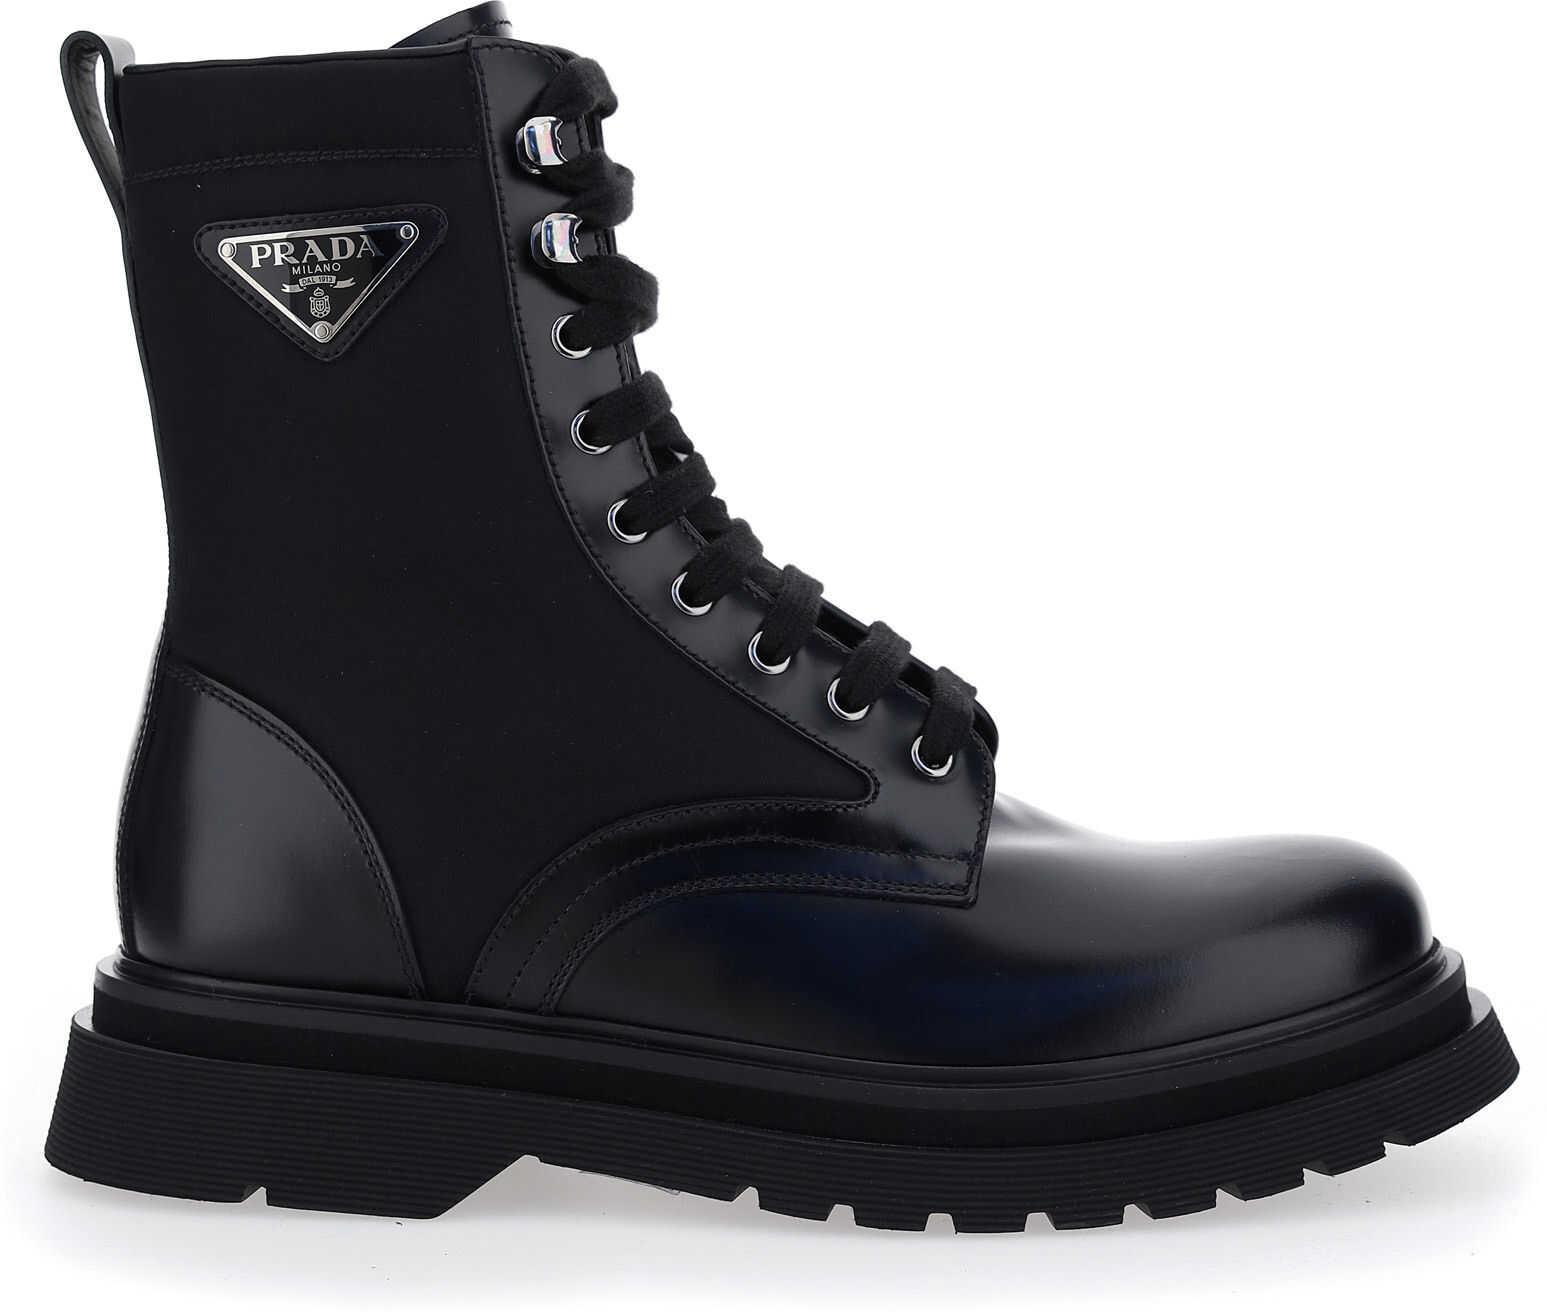 Prada Boots 2UE0113L09 N/A imagine b-mall.ro